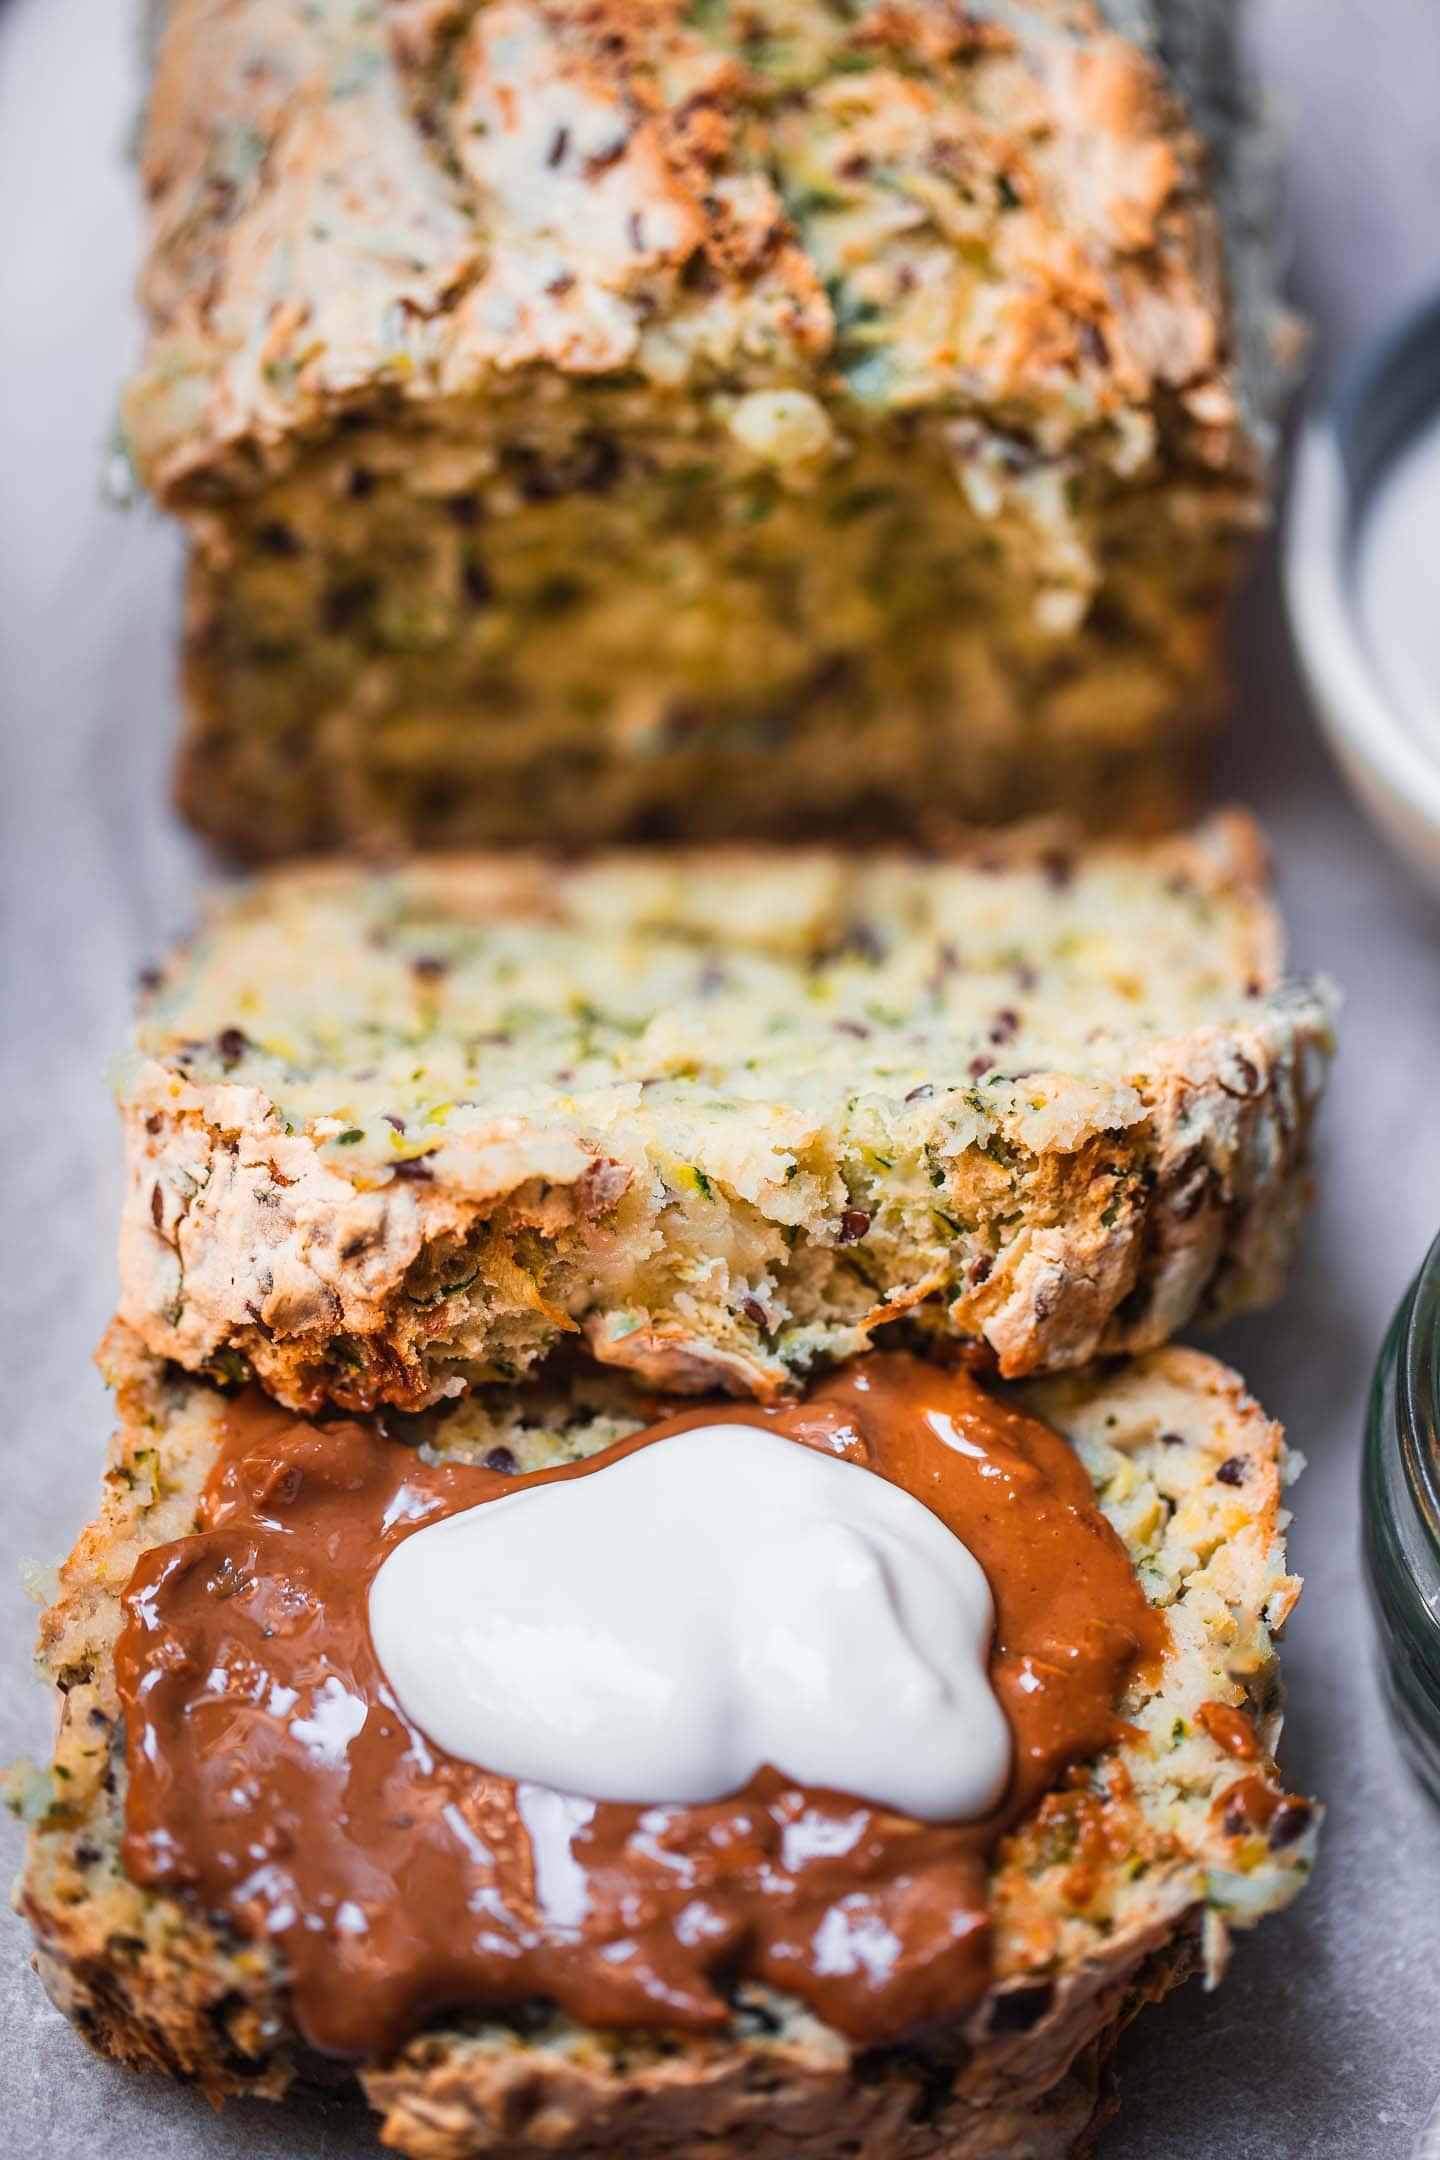 Gluten-free vegan zucchini bread